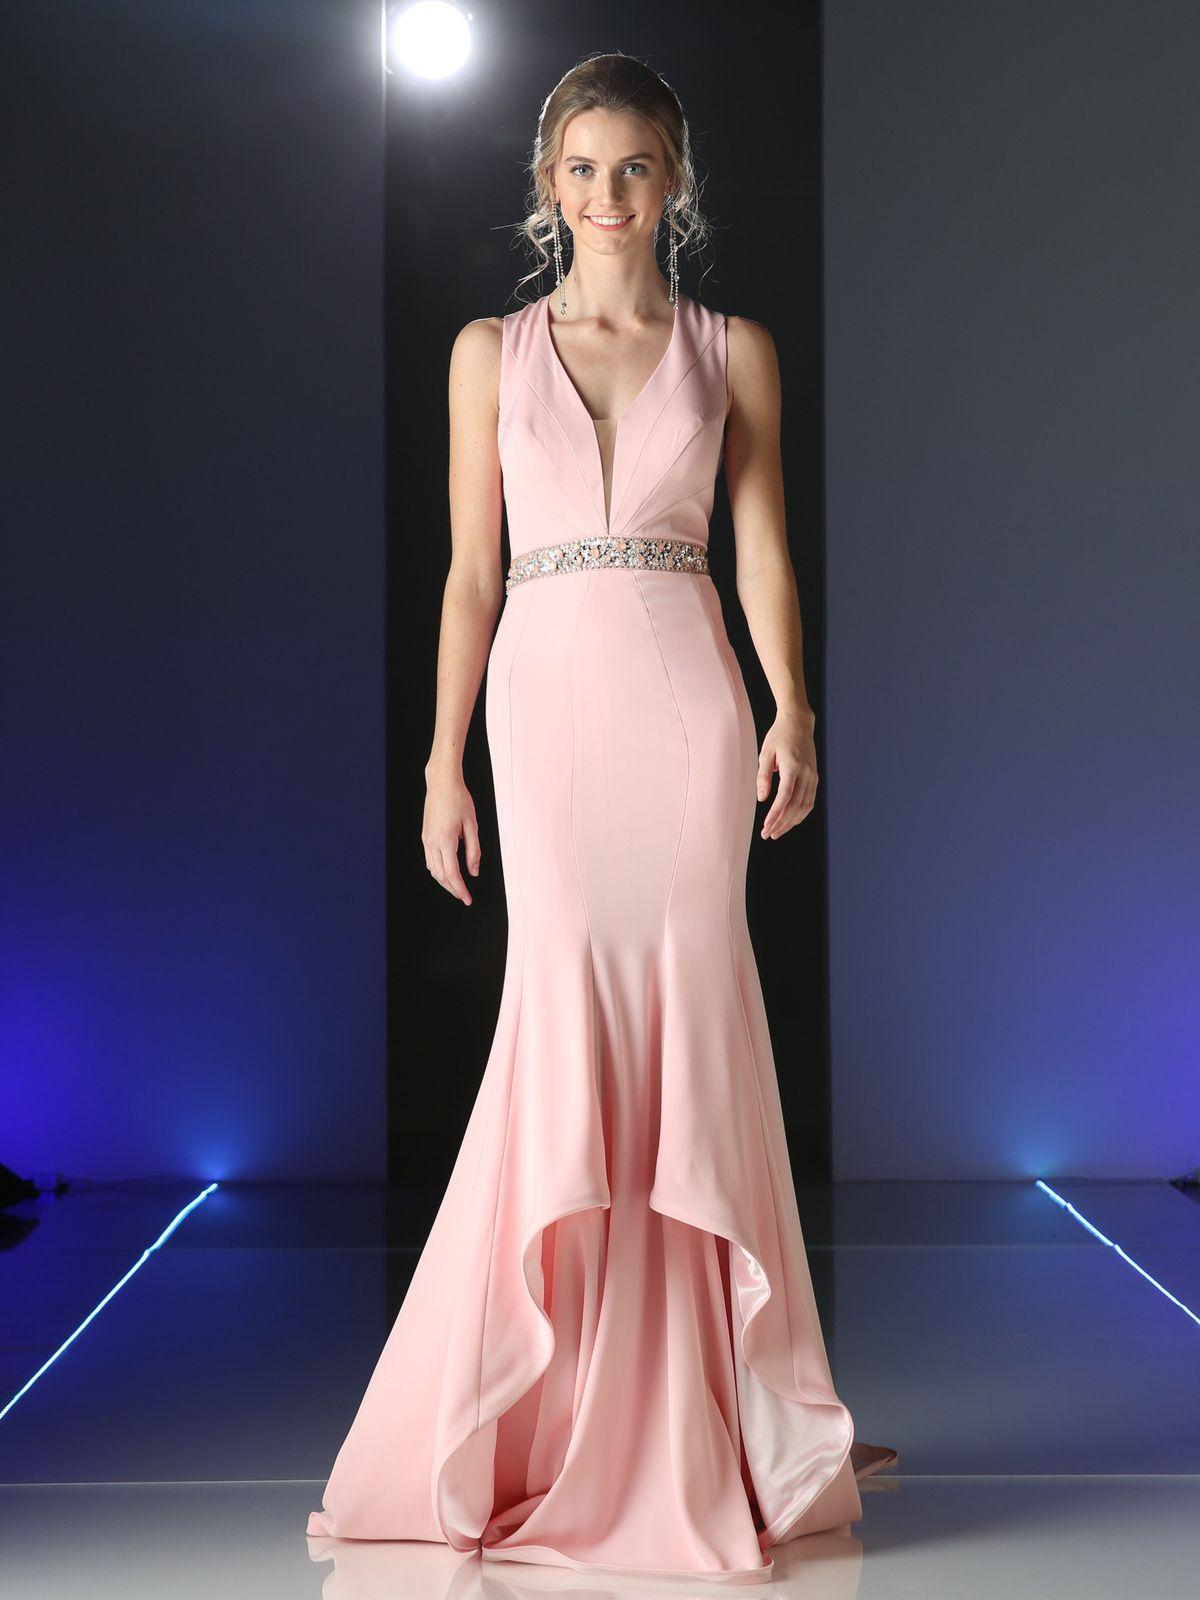 Elegant Long Evening Dress   Sung Boutique L.A.   Prom Dress 2016 ...